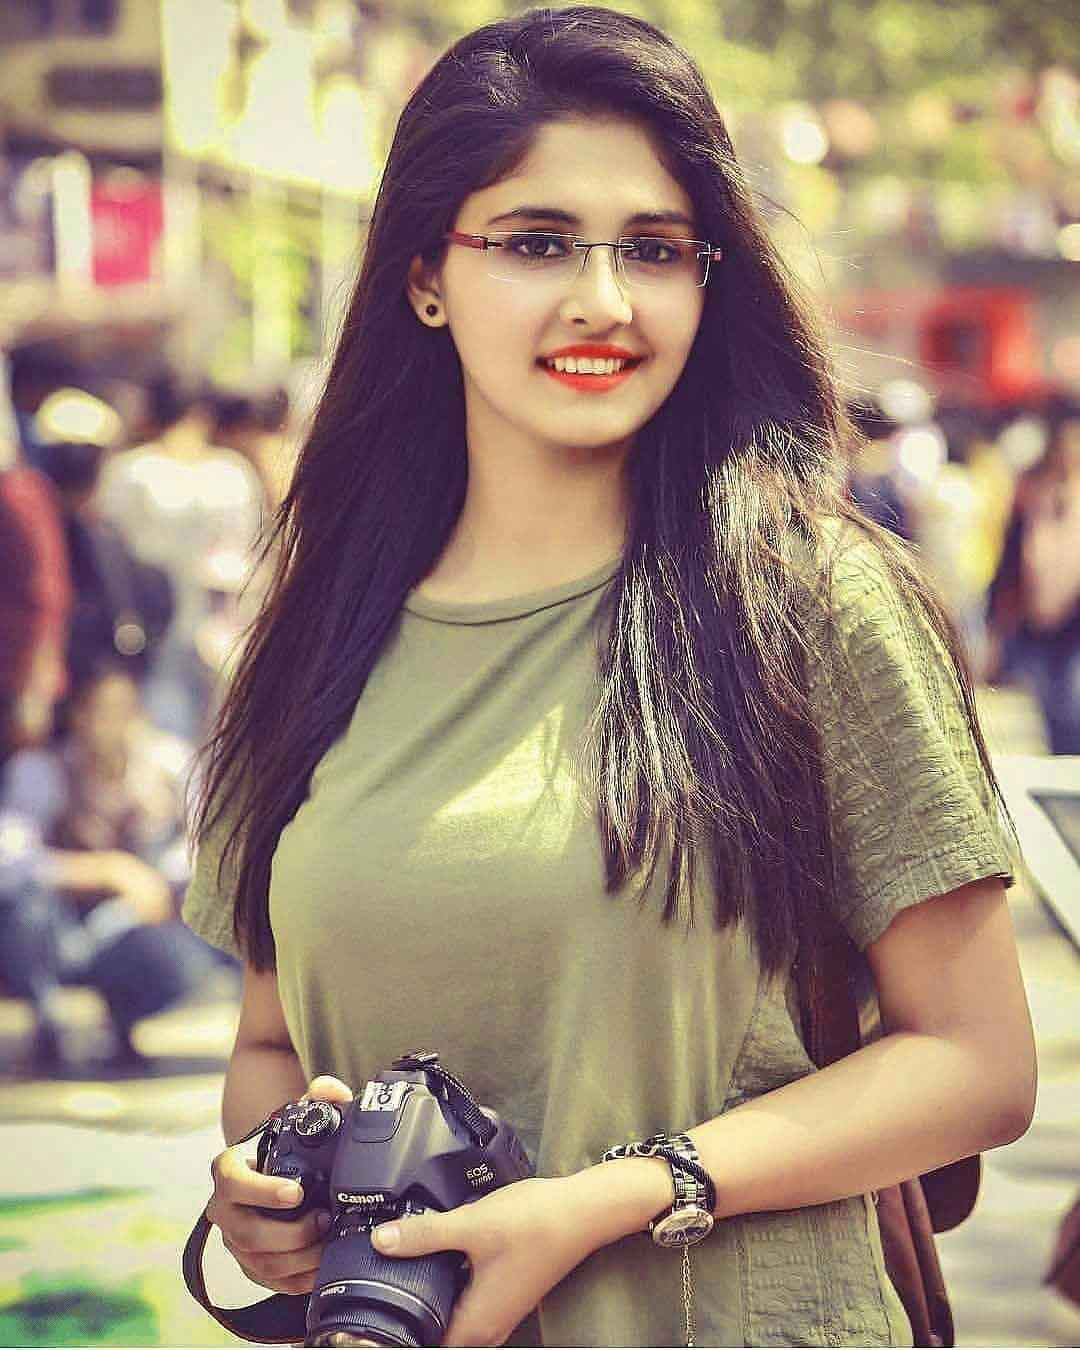 latest girl Whatsapp Dp Profile Images photo free hd